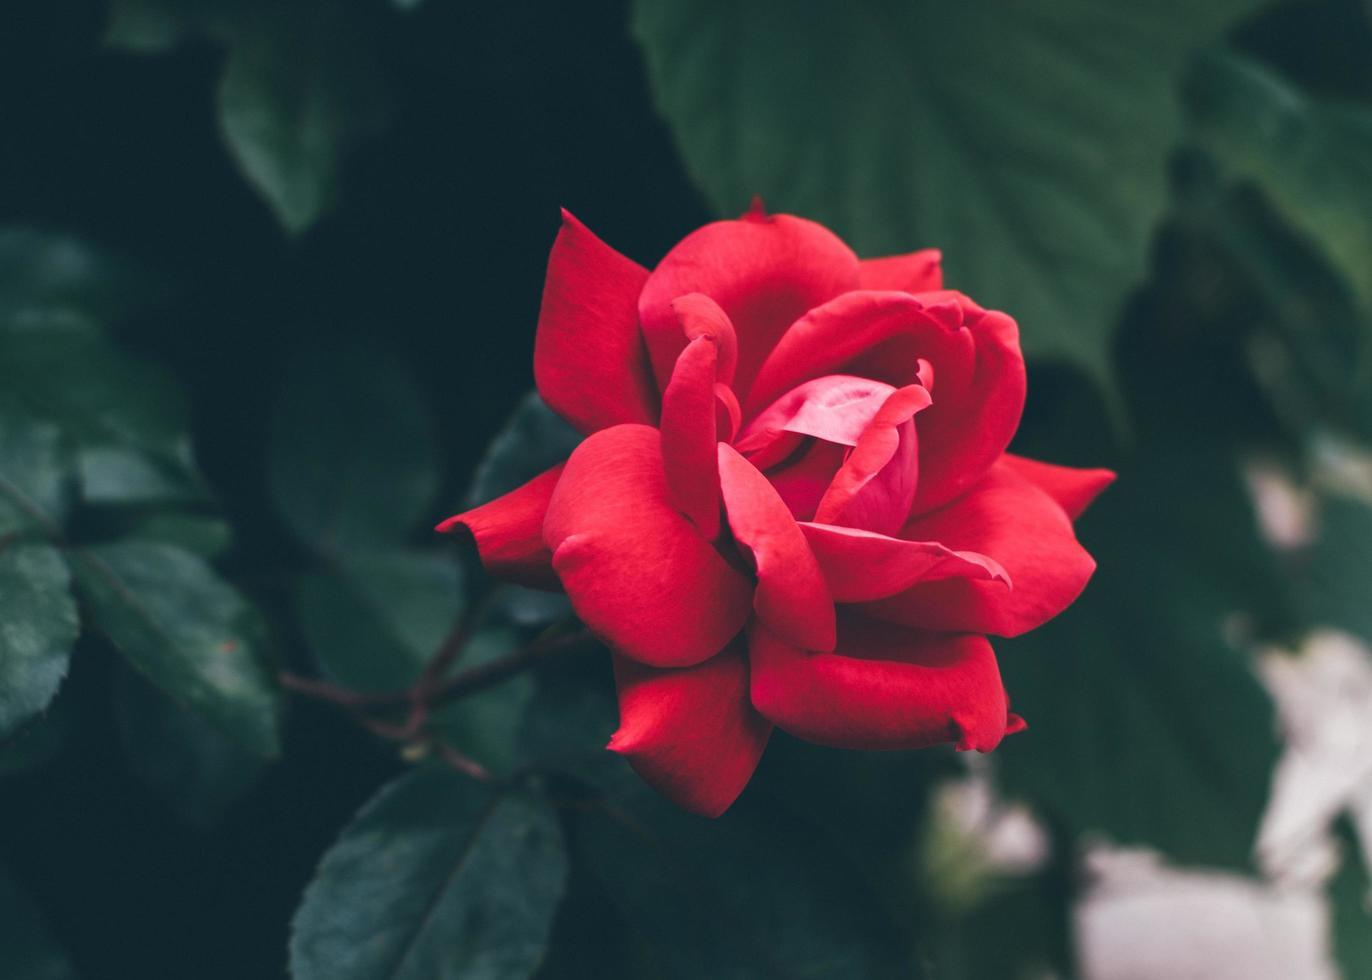 rode roos in de tuin foto